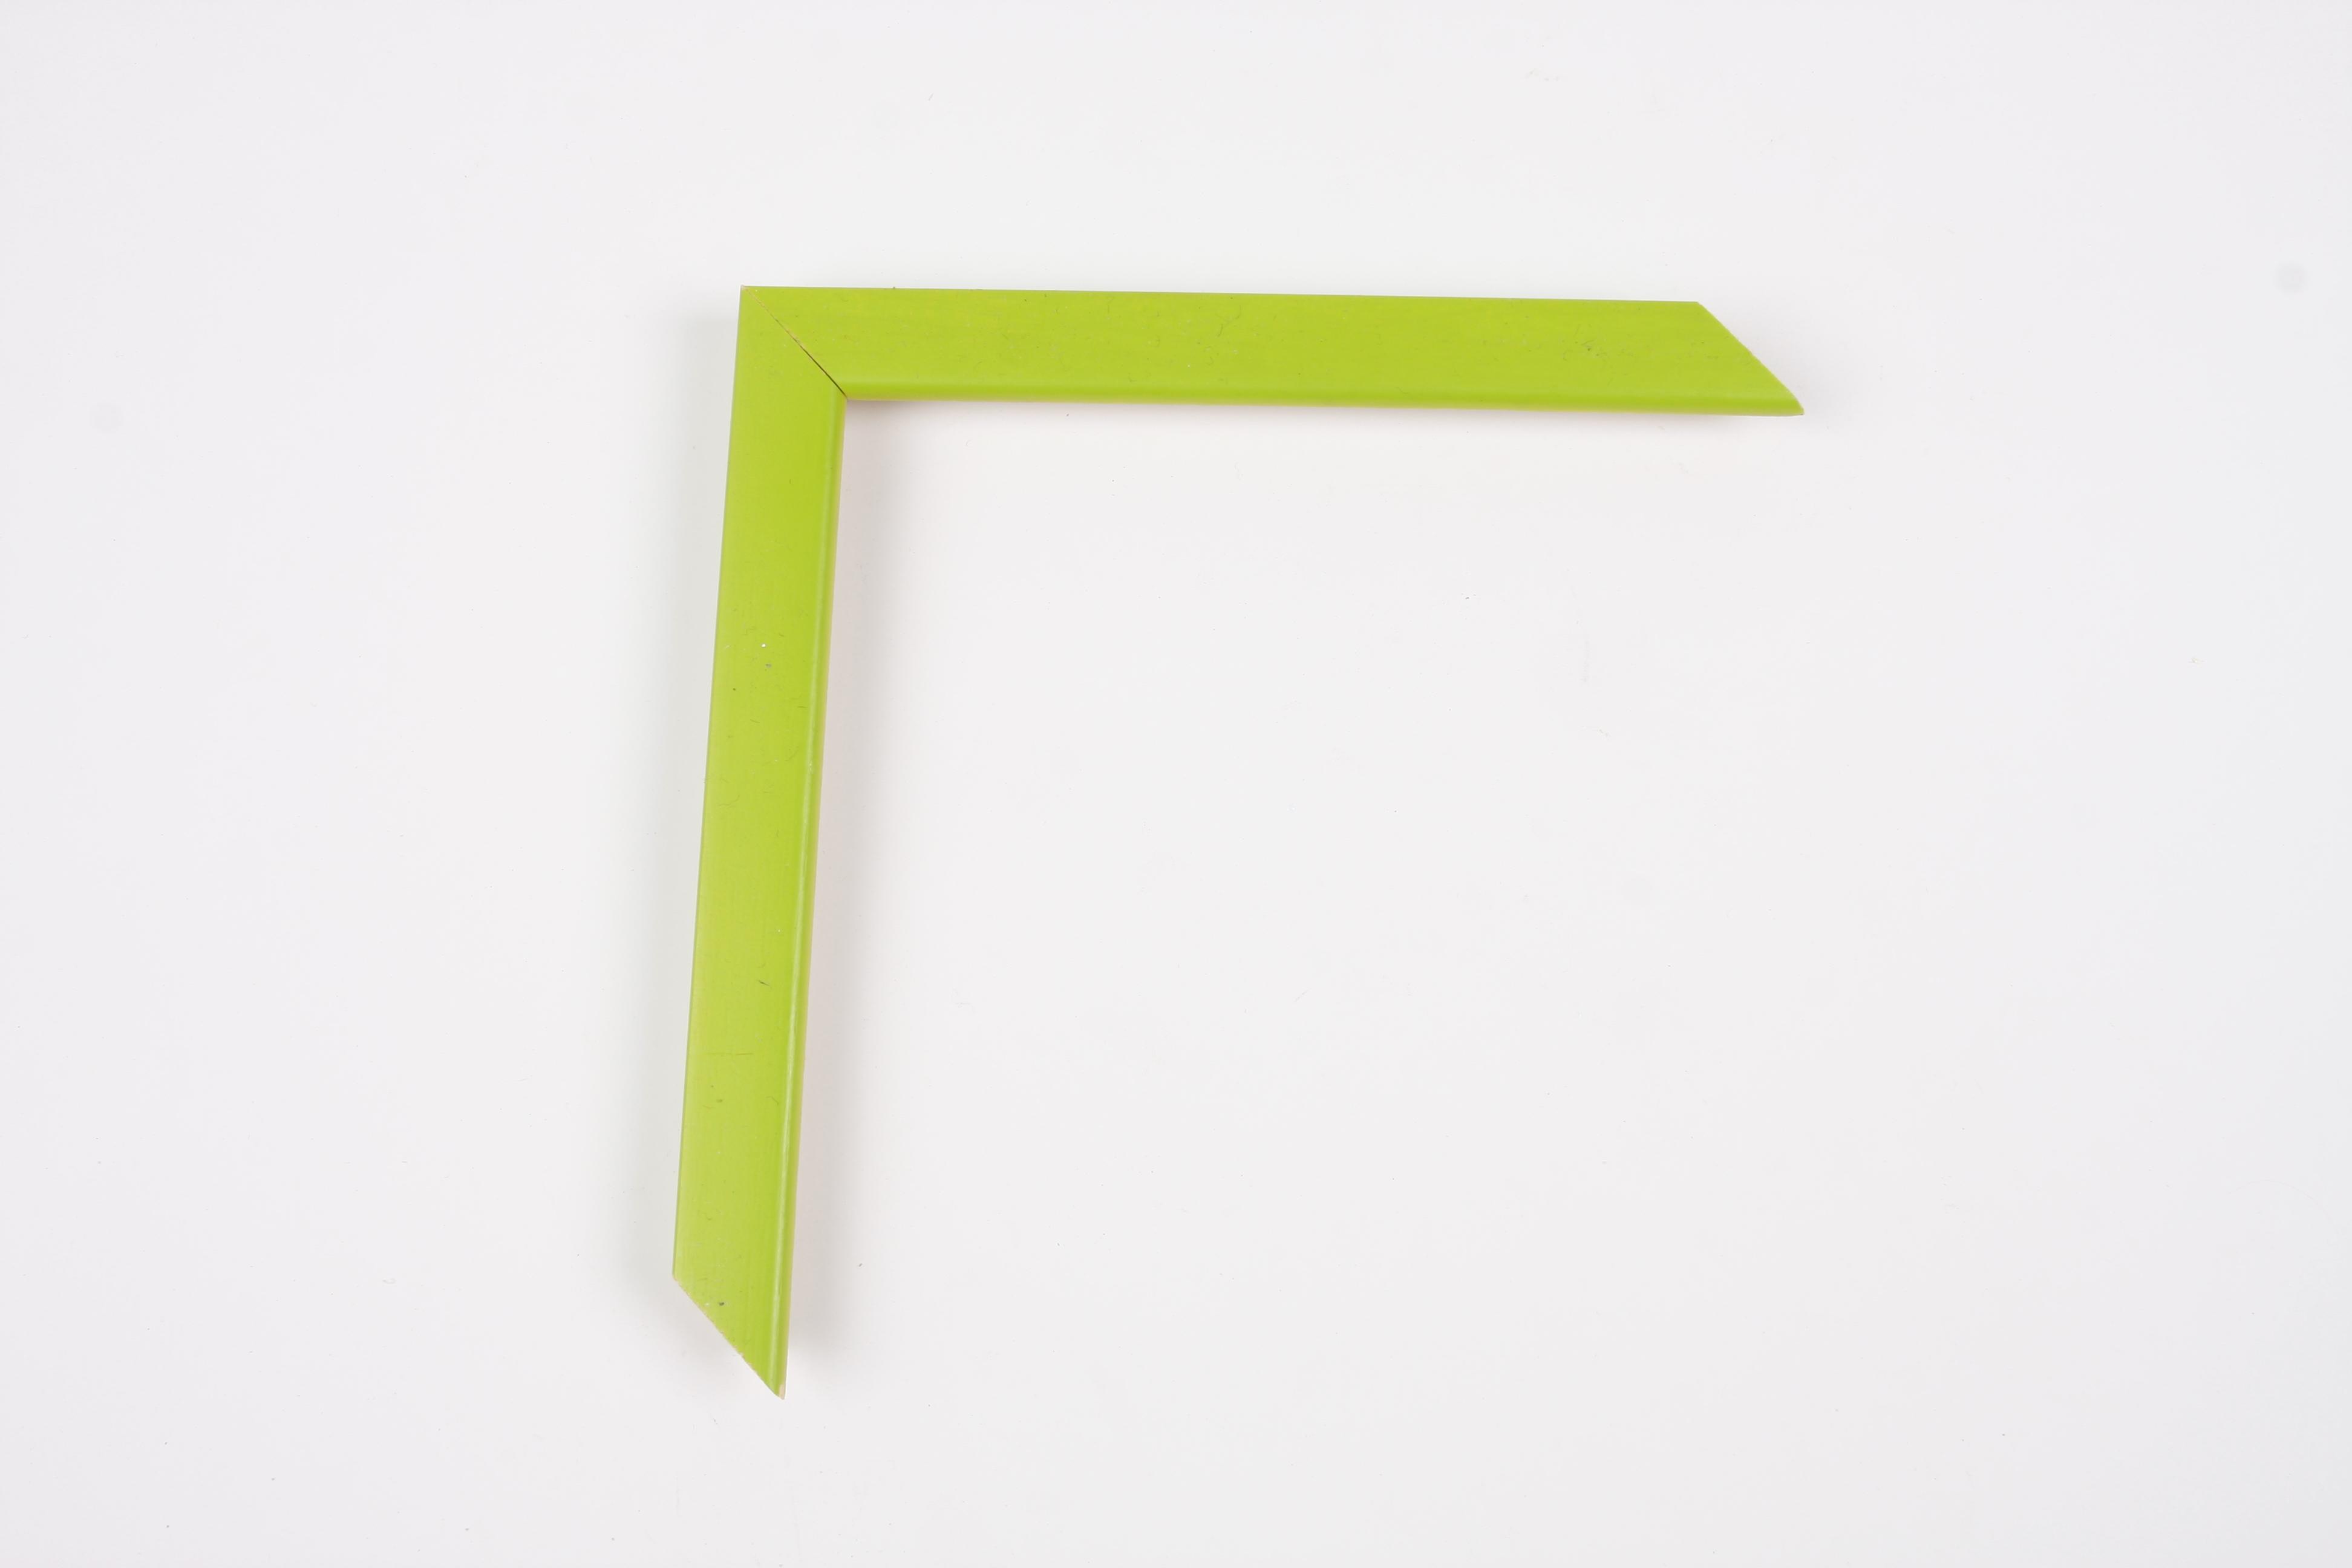 00290-588-VERDE-ancho1,8cm